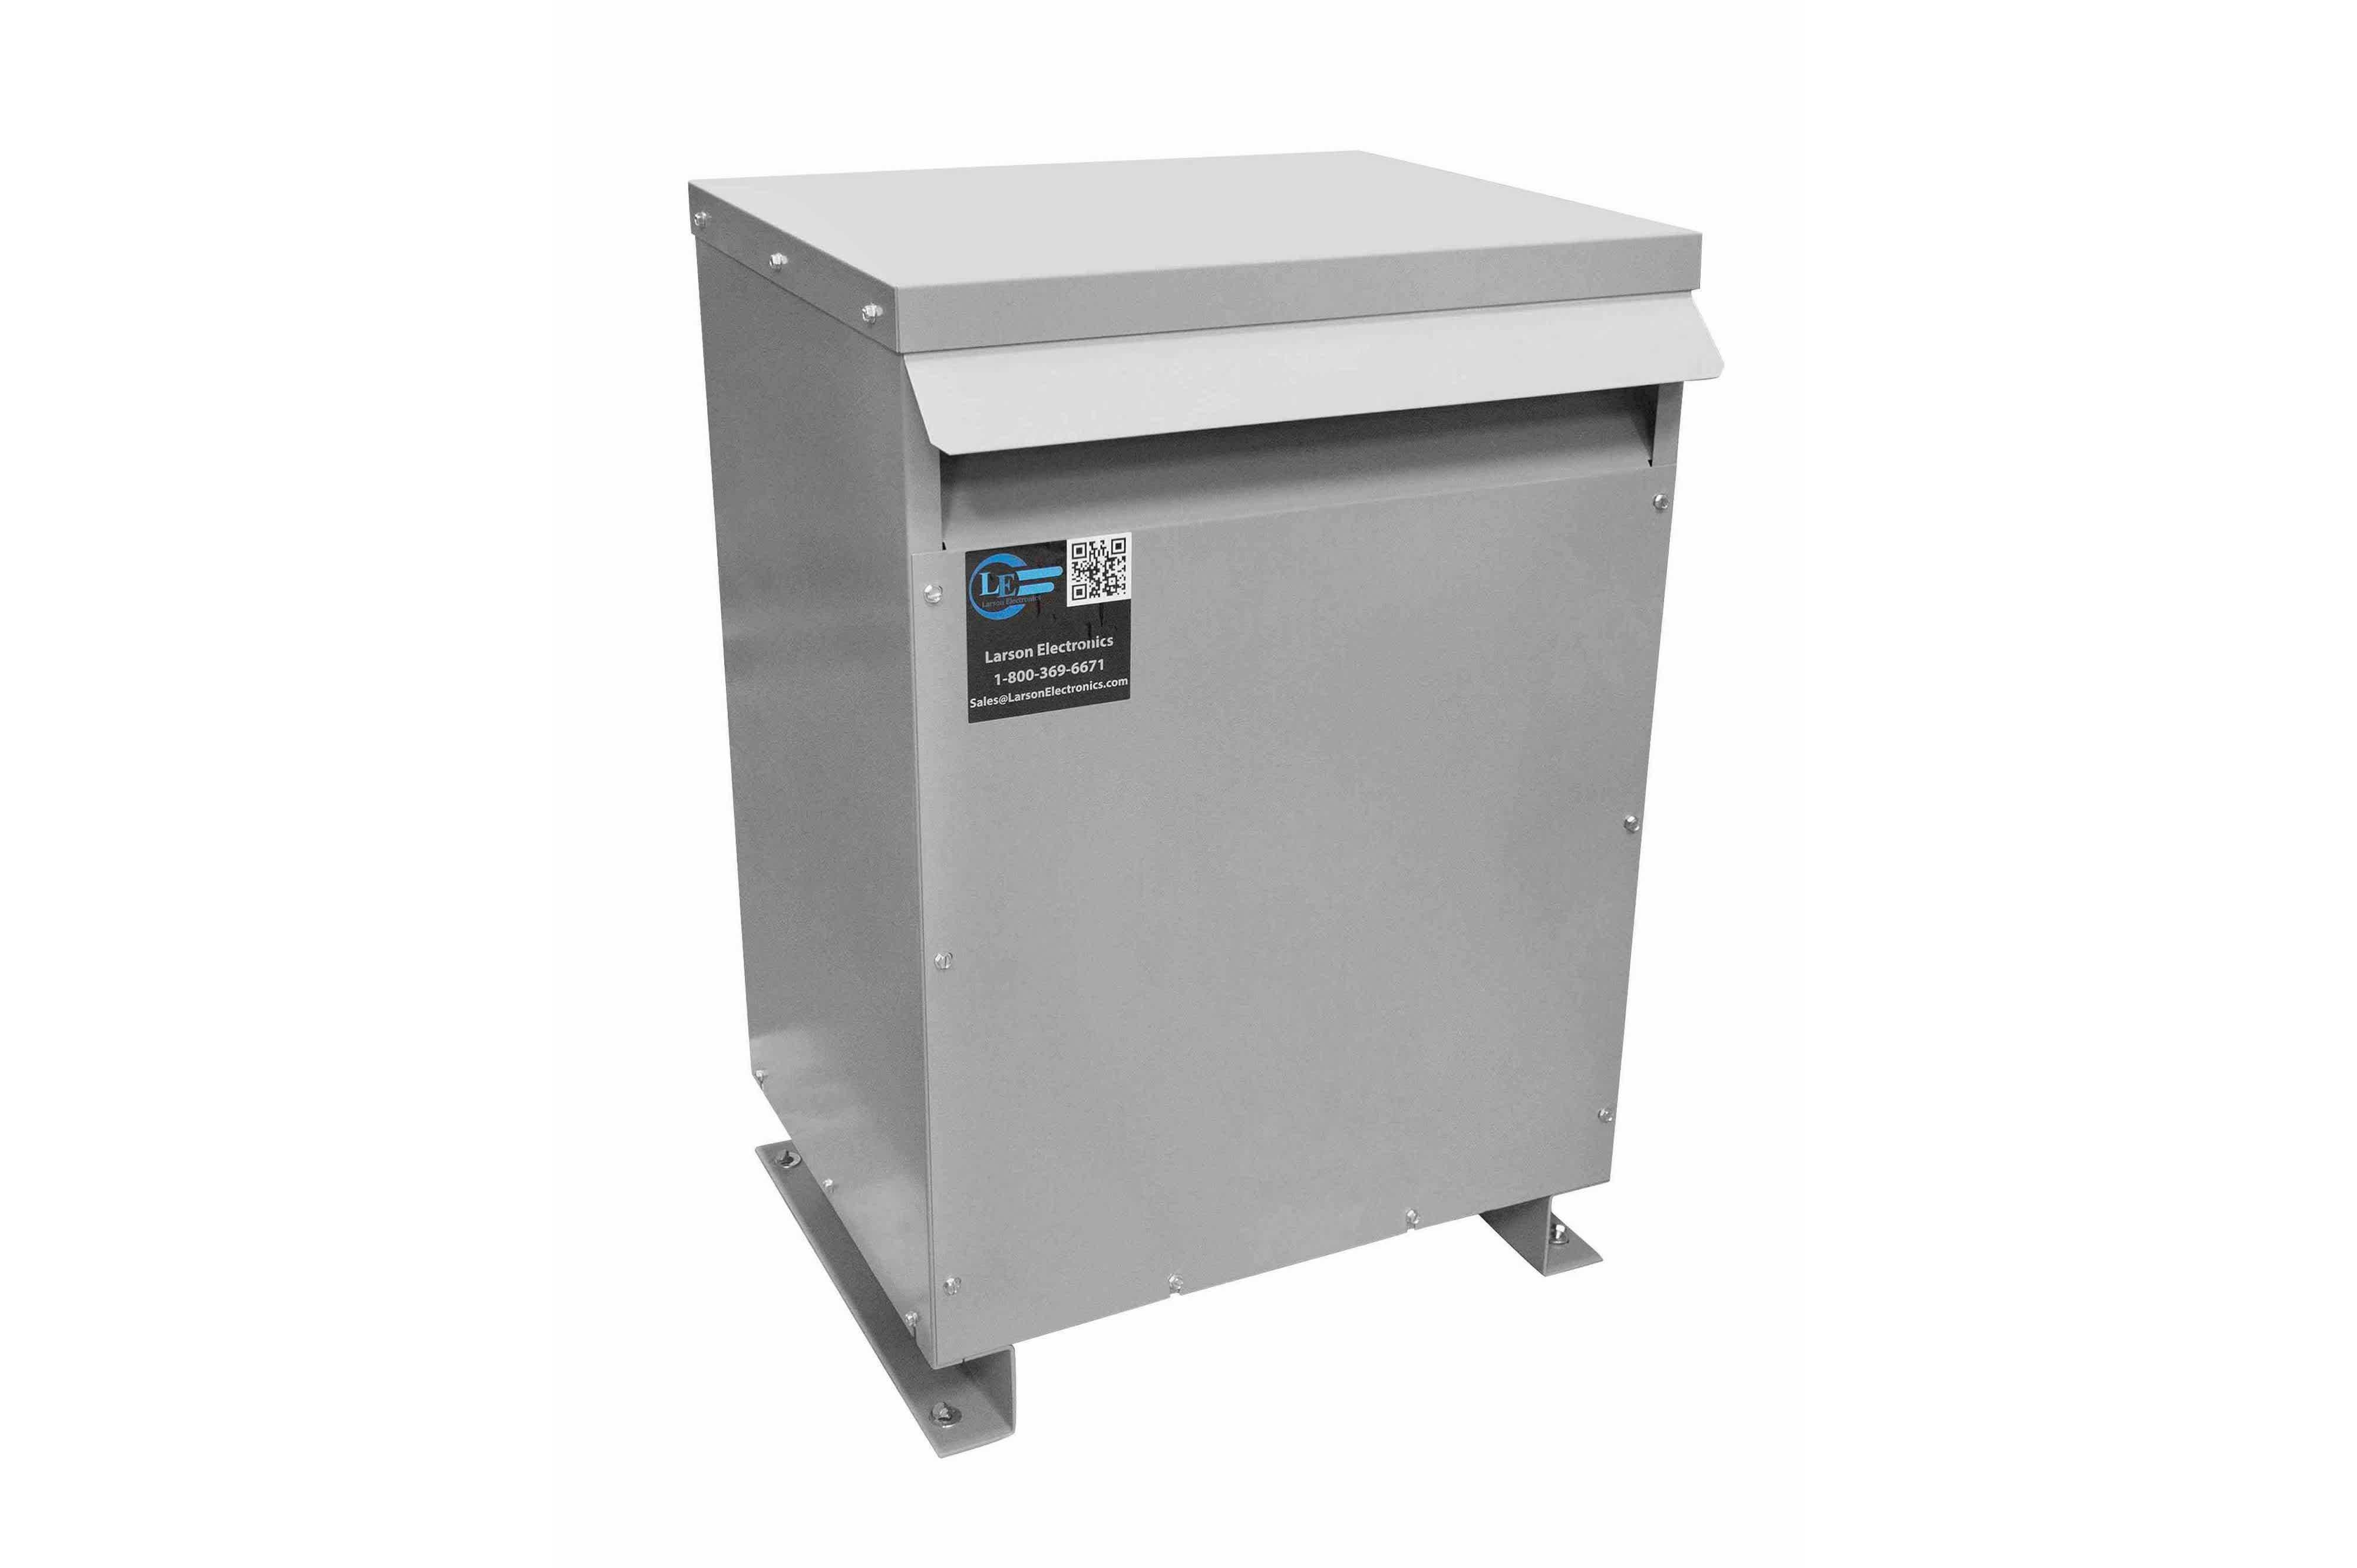 42.5 kVA 3PH Isolation Transformer, 480V Wye Primary, 208V Delta Secondary, N3R, Ventilated, 60 Hz